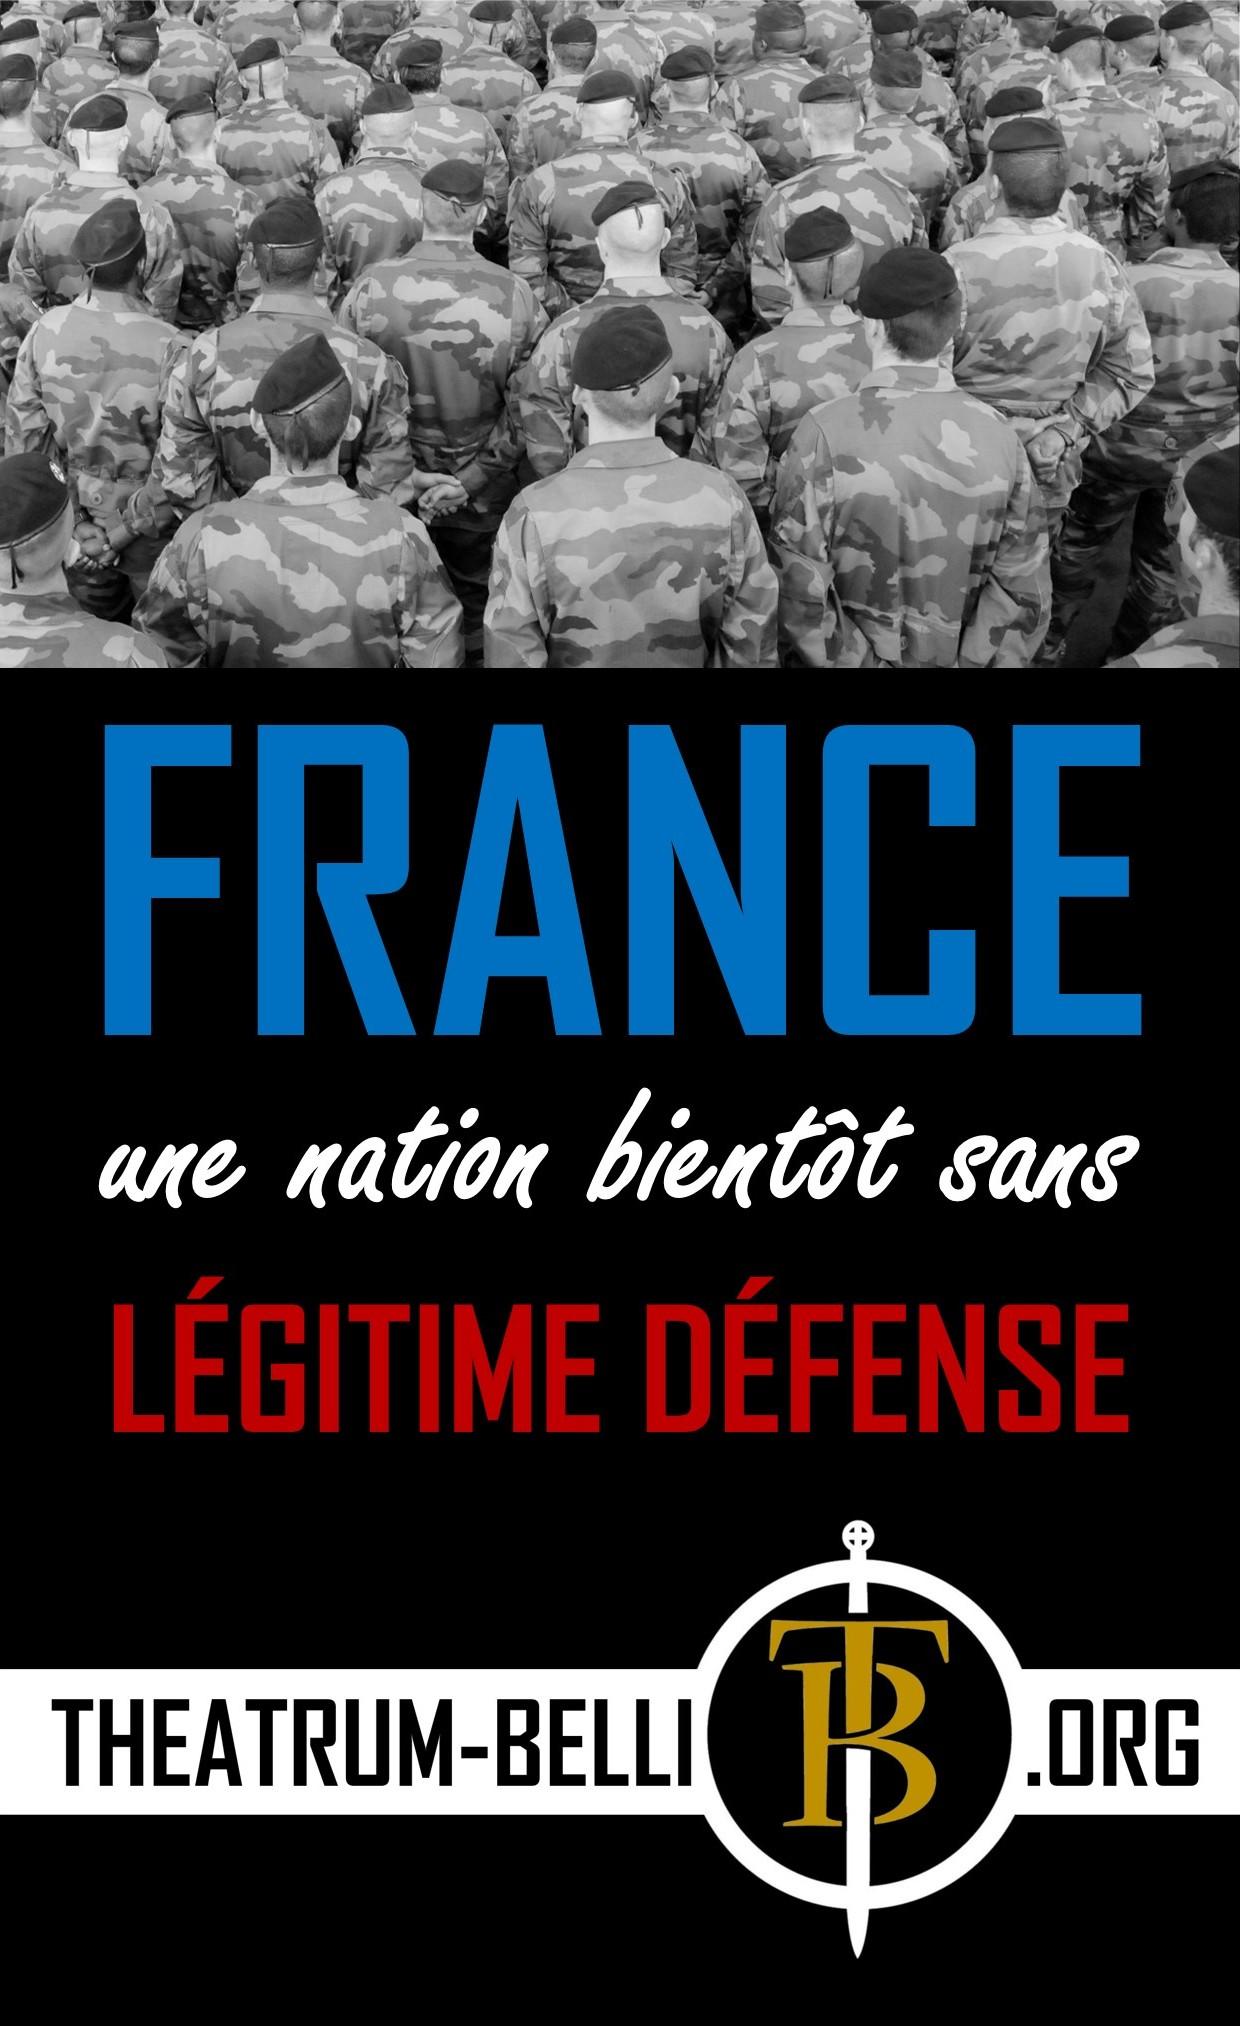 France légitime défense 3